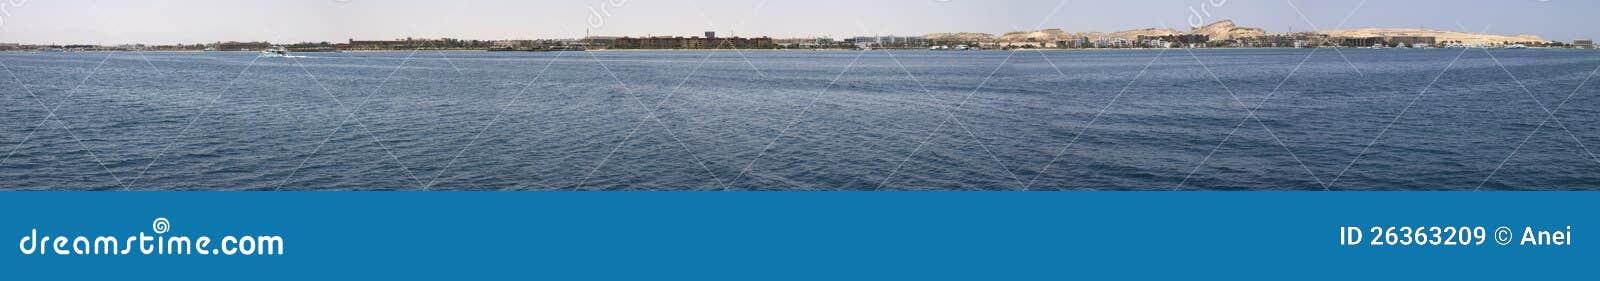 Strandinsel in Hurghada